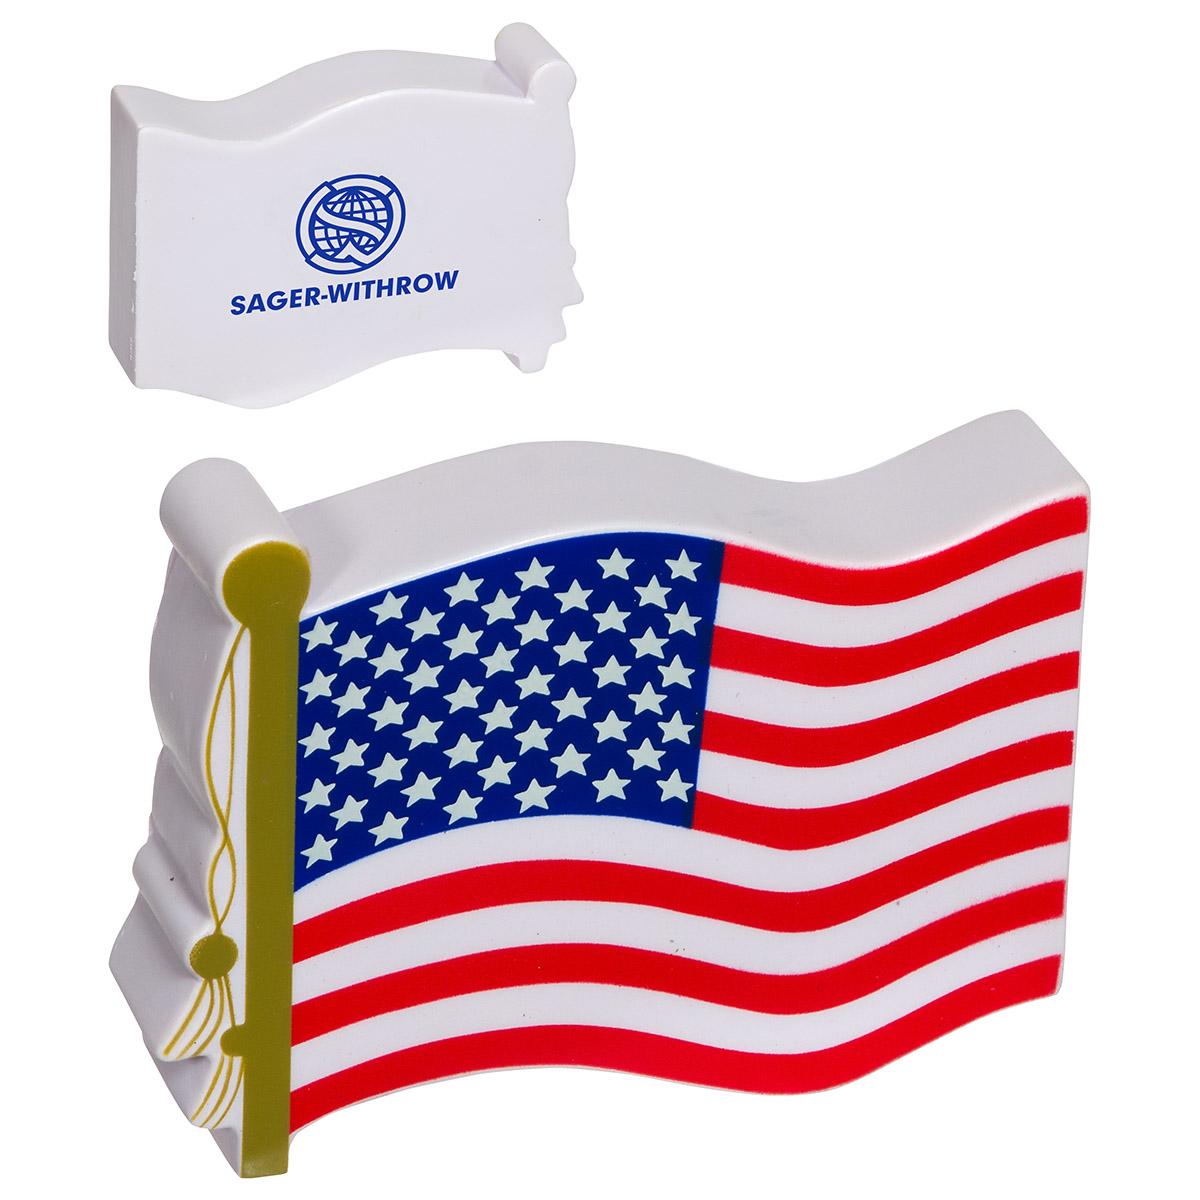 US Flag Stress Reliever, LPA-UF28 - 1 Colour Imprint